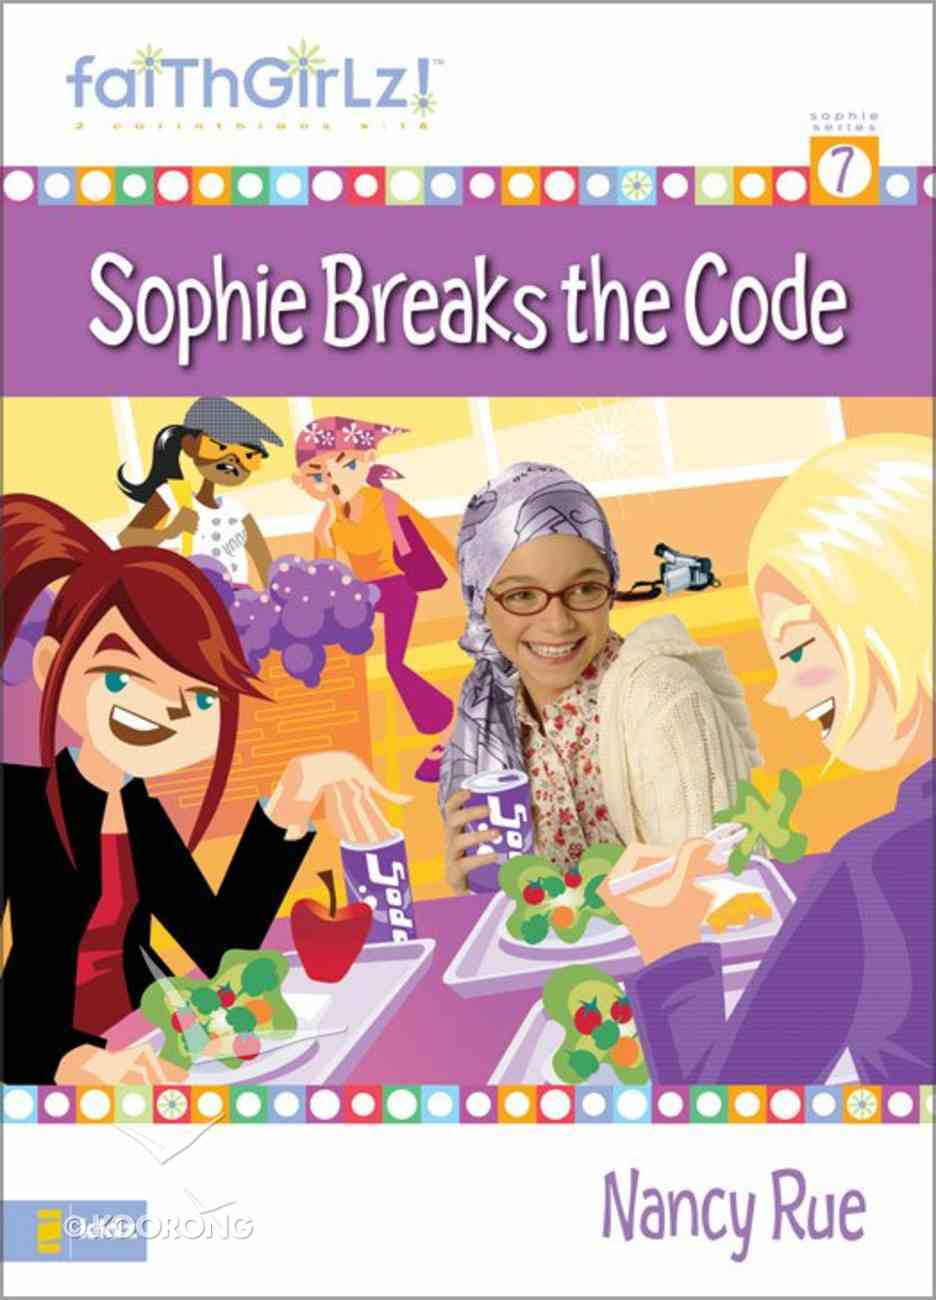 Sophie's Friendship Fiasco (Prev. Sophie Breaks the Code) (#07 in Faithgirlz! Sophie Series) eBook